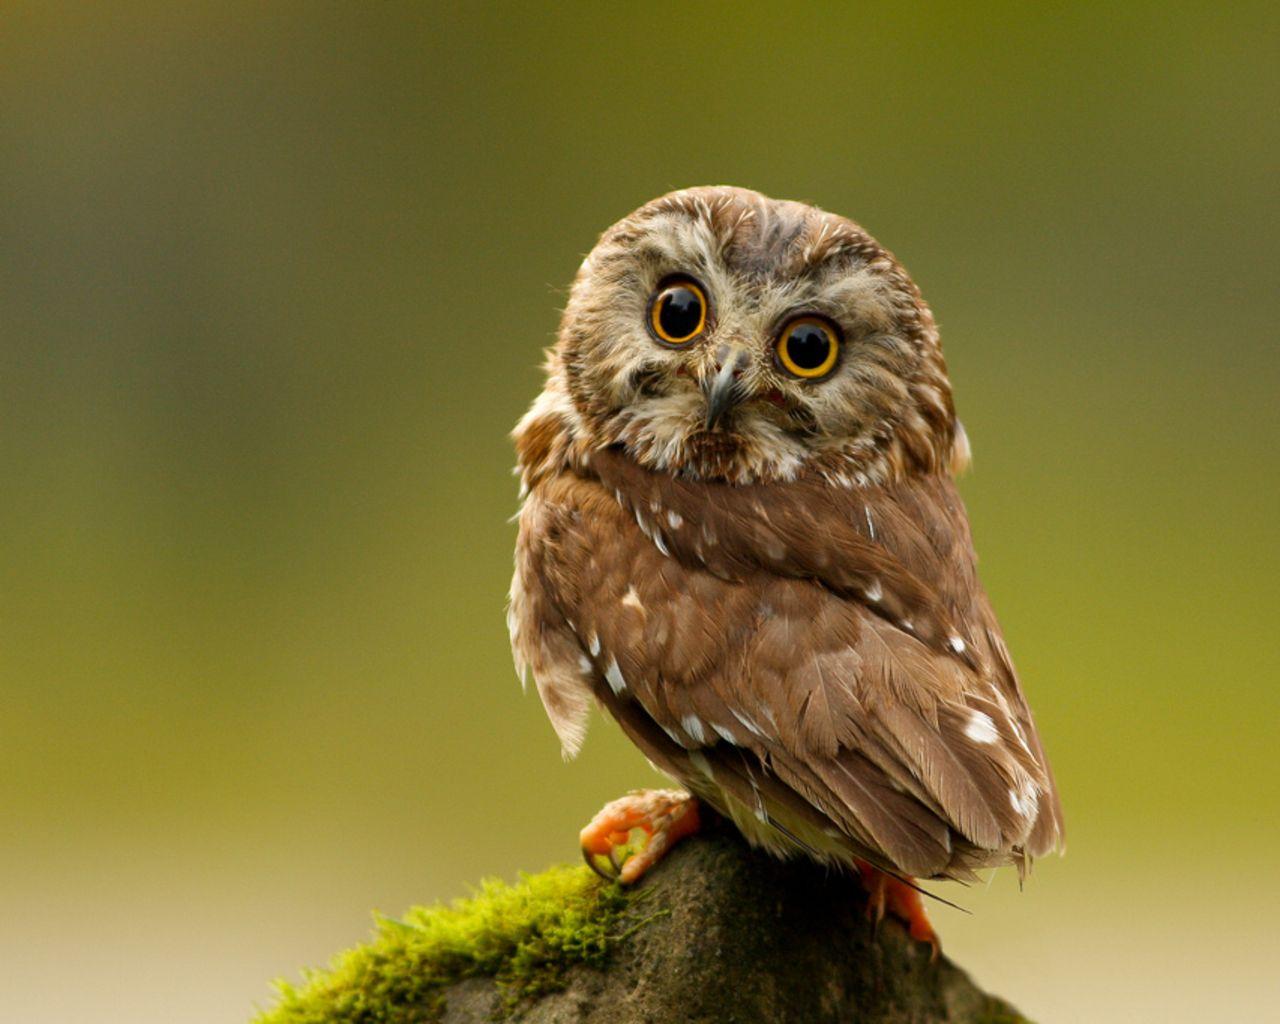 Owl appreciation thread [Archive] - Bluelight | animal